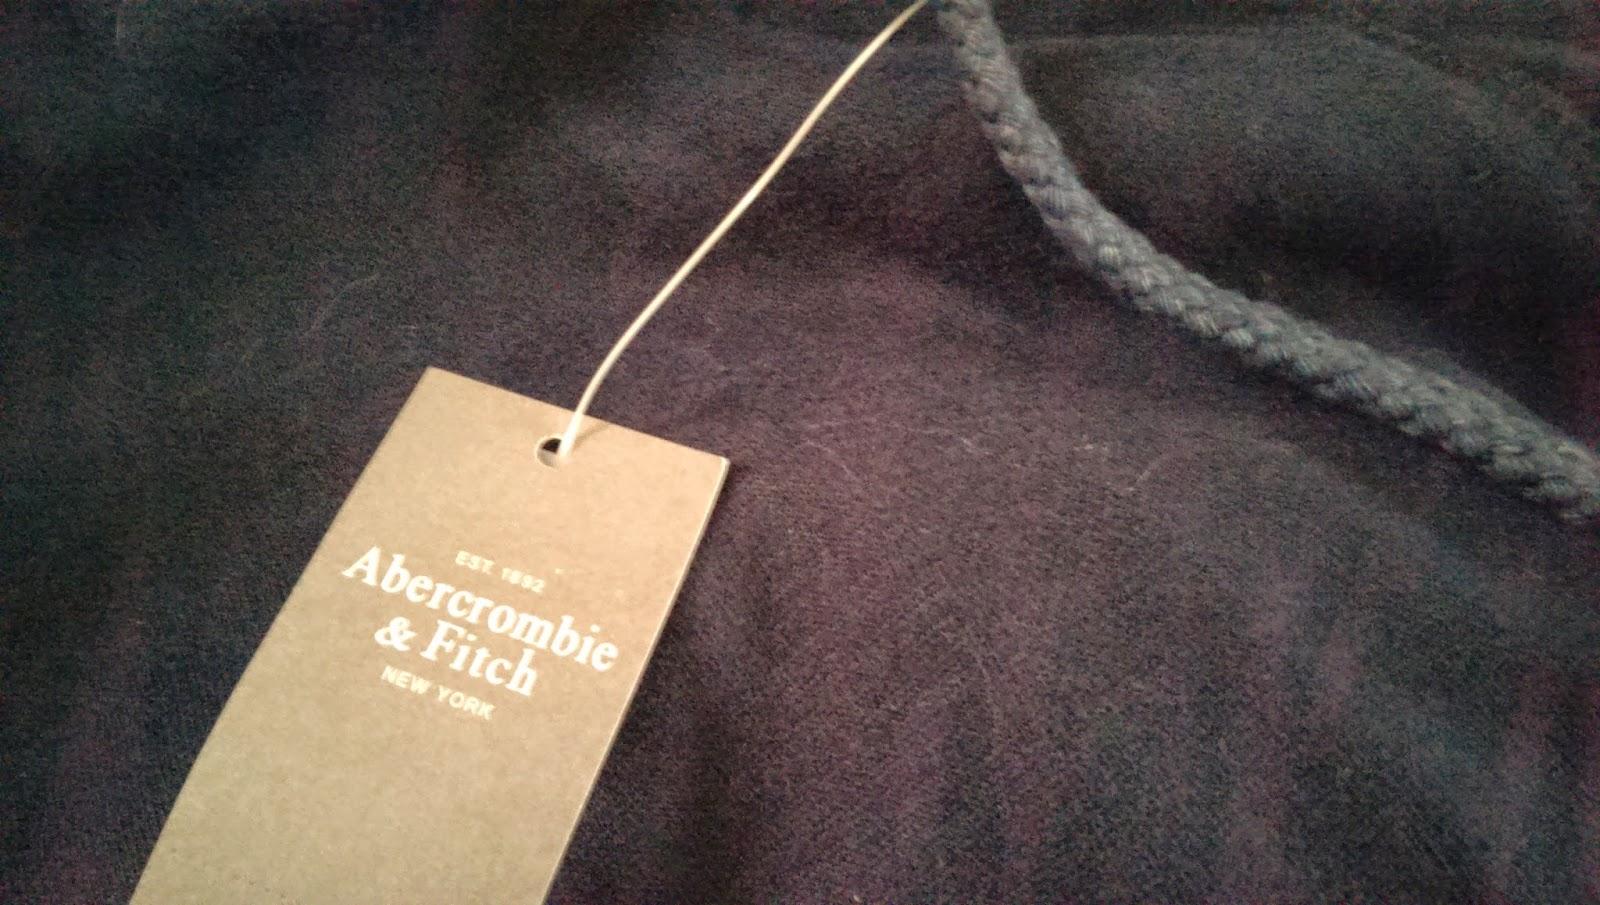 2015 01 10%2B13.21.30 - [淘寶購物初體驗] 開箱囉!A&F厚重的刷毛外套+評價商品篇!